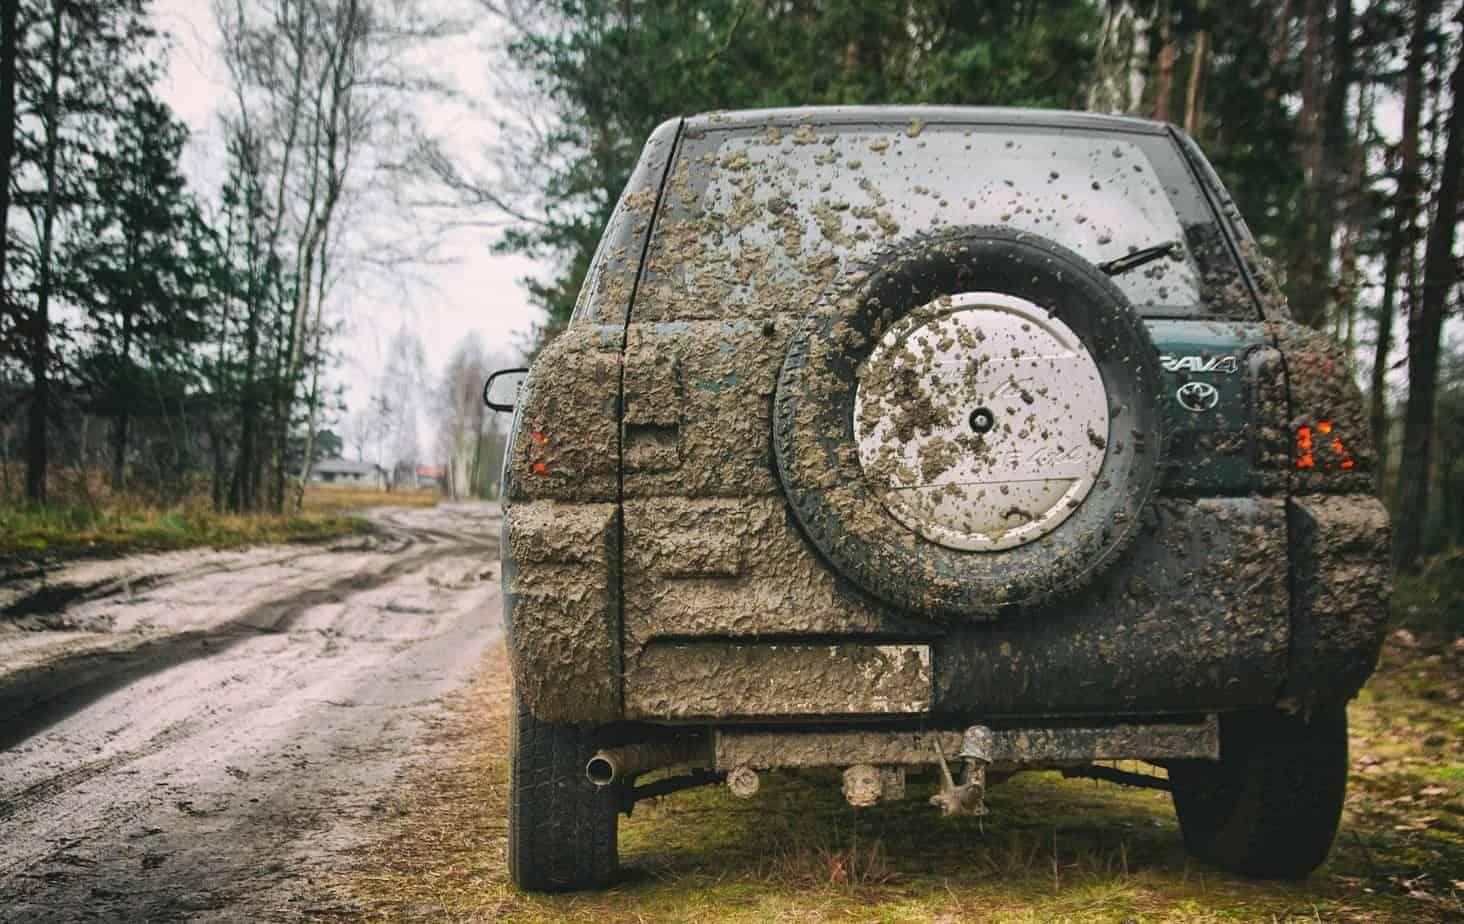 Verschmutzter Jeep am Straßenrand